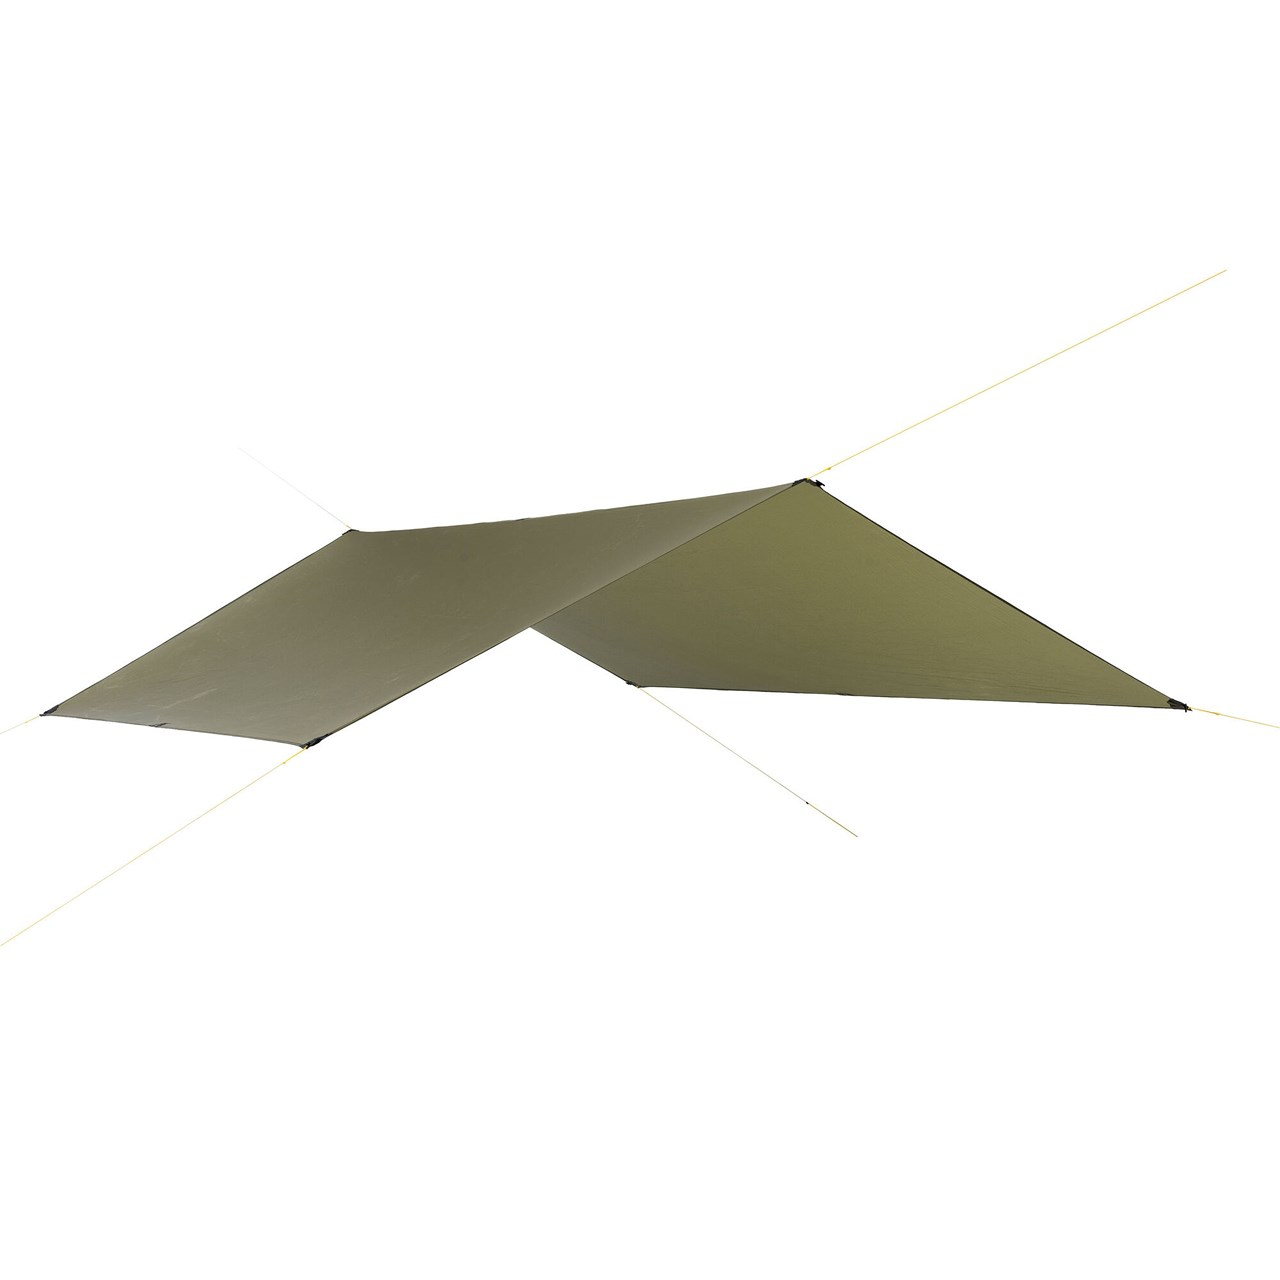 Helsport Bitihorn Pro Tarp 3,5x2,9m